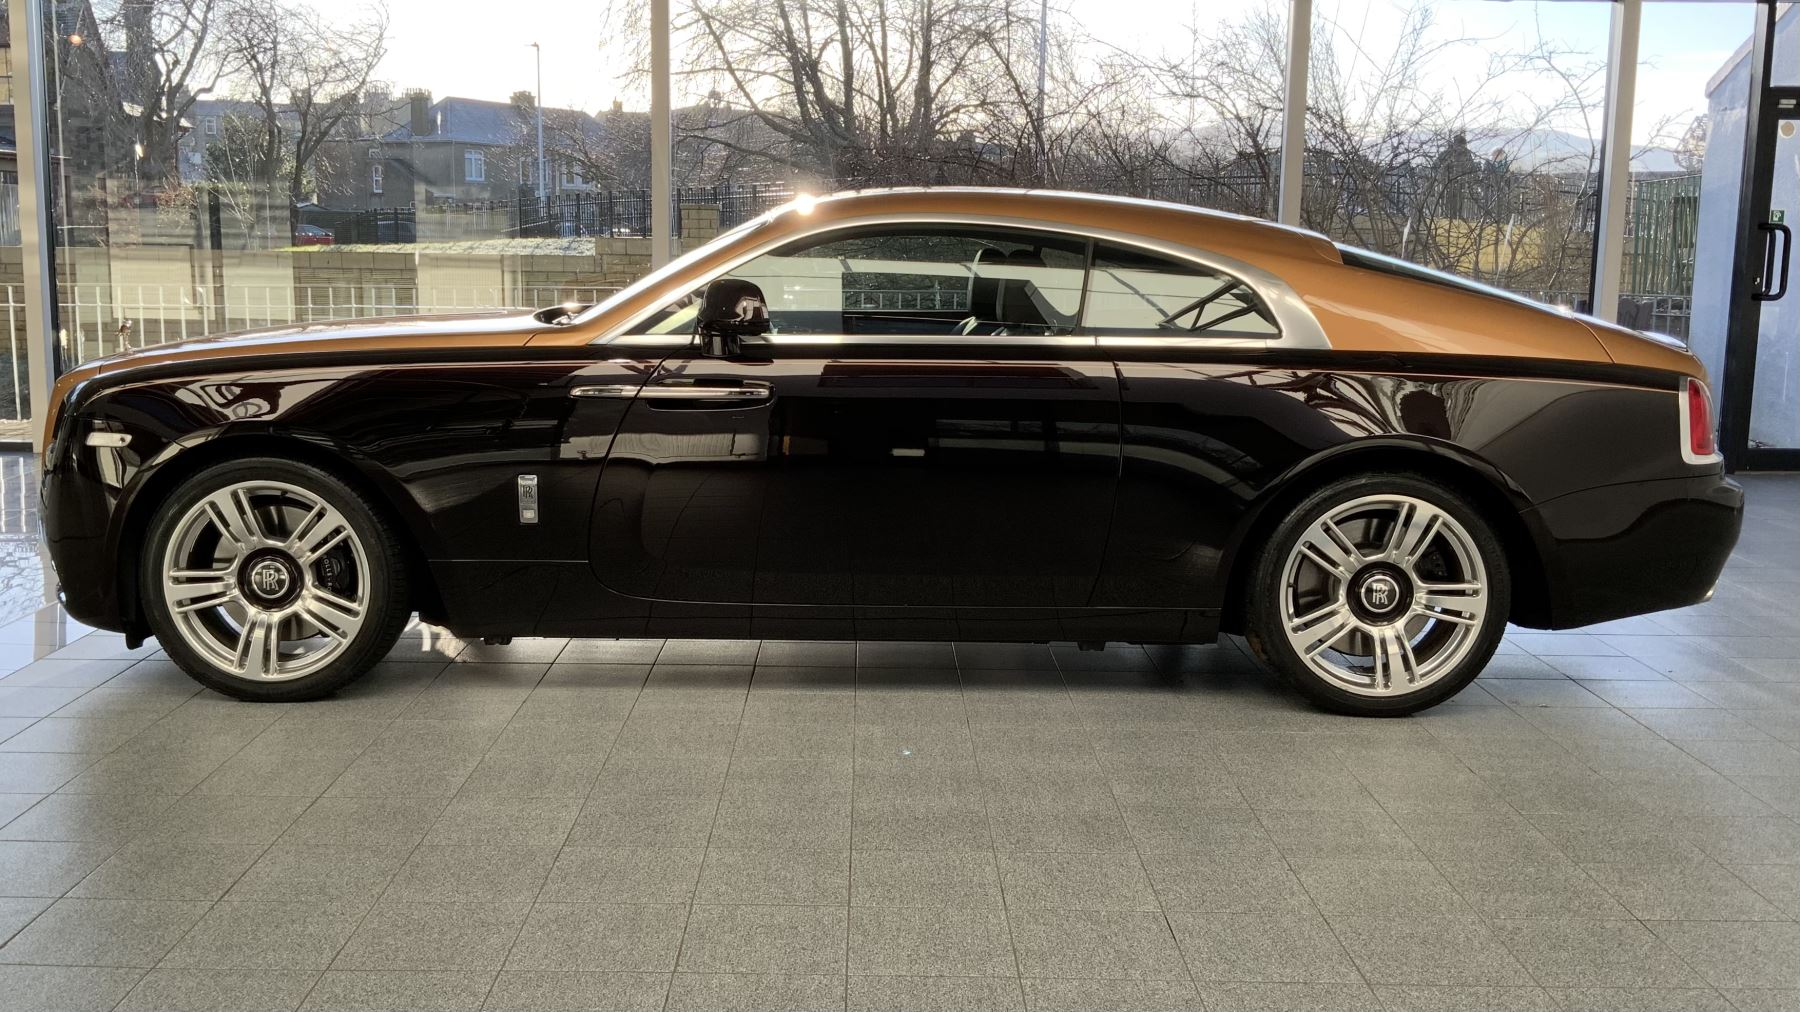 Rolls-Royce Wraith V12 6.6 Automatic 2 door Coupe (2016)